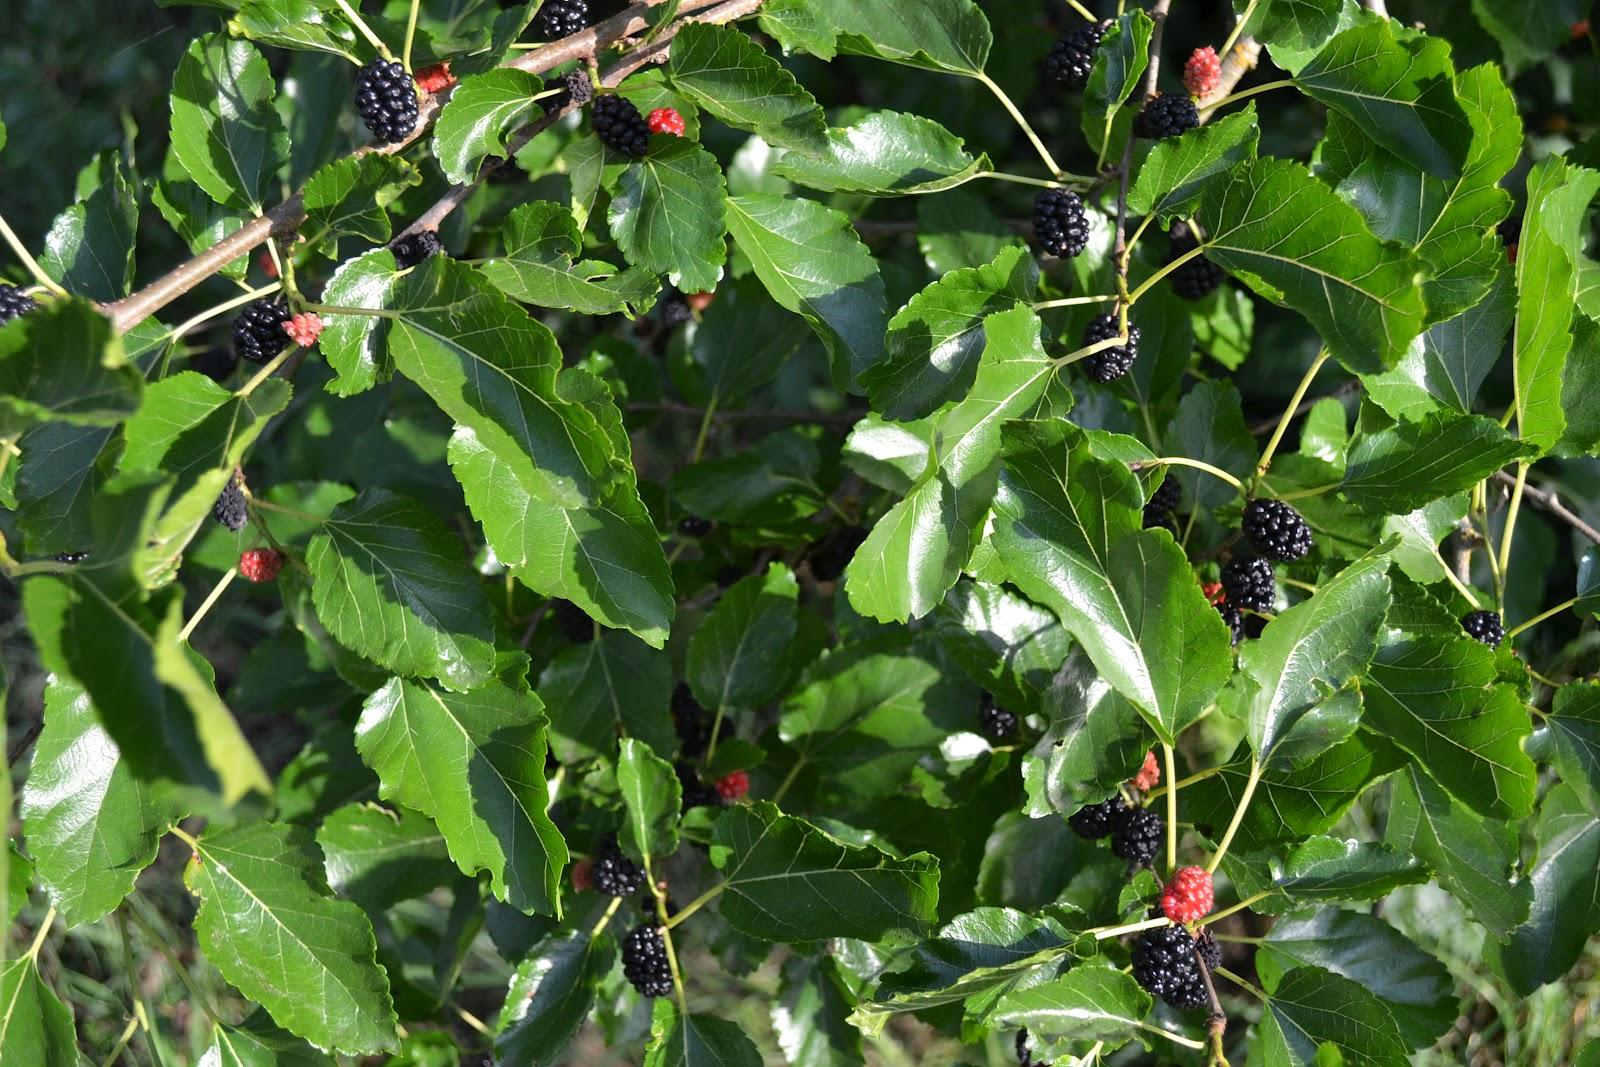 Bush clipart blackberry bush Blackberry bush 80136 Clipart BITNOTE